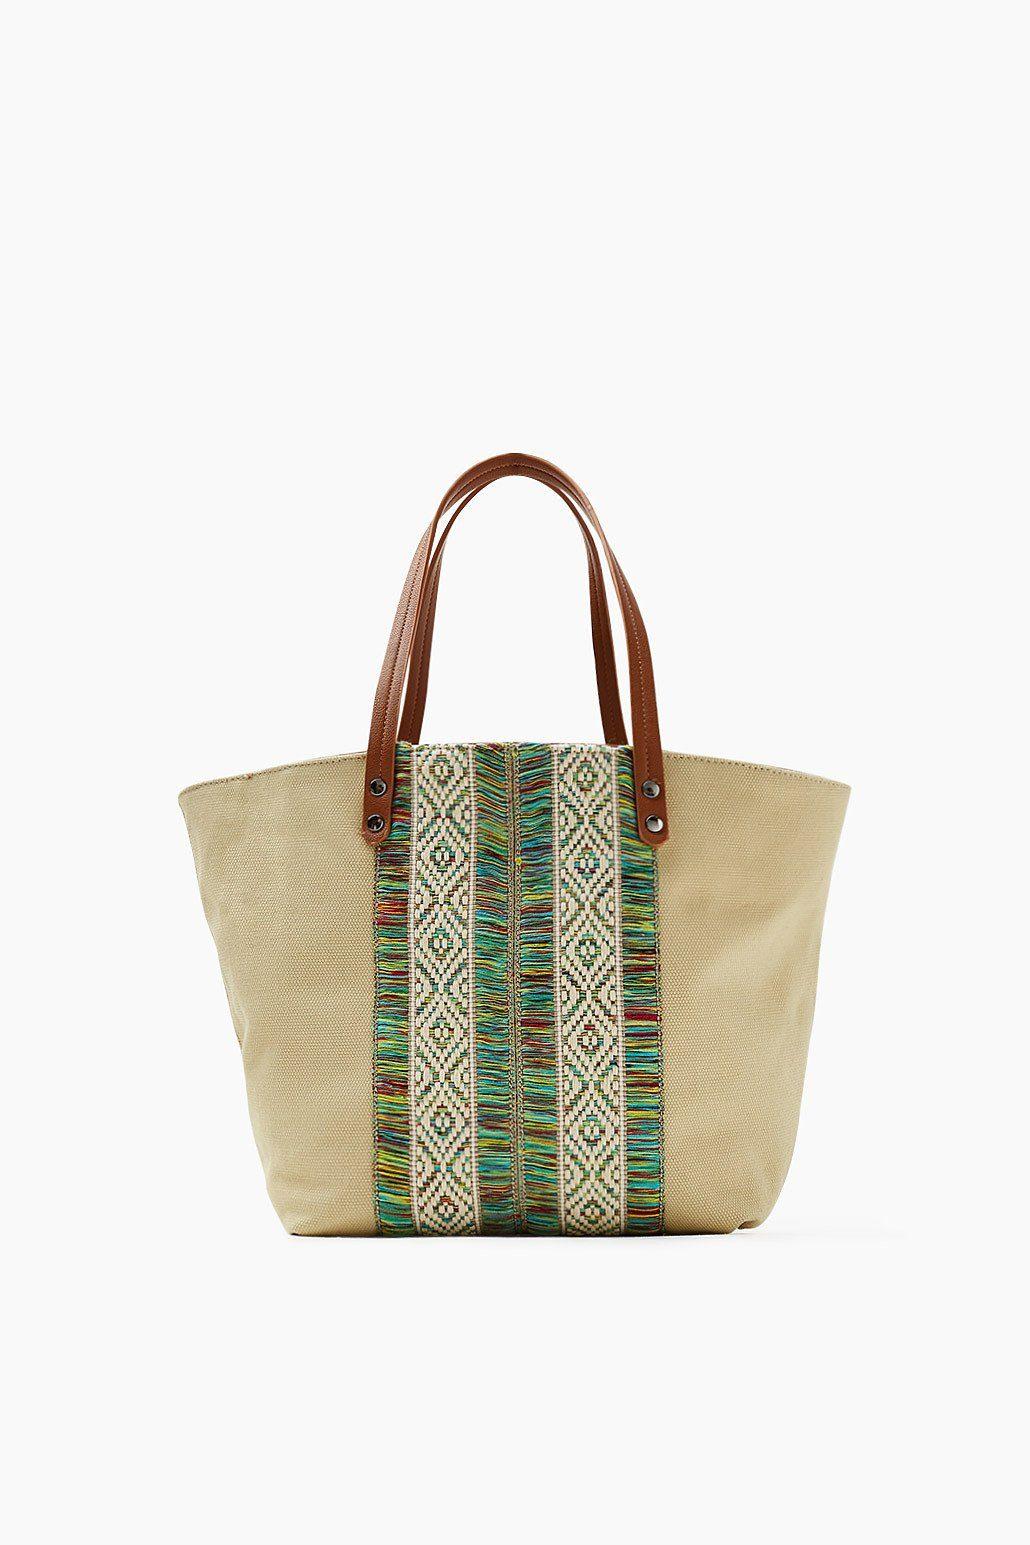 ESPRIT CASUAL Canvas-Shopper mit Boho-Stichtings